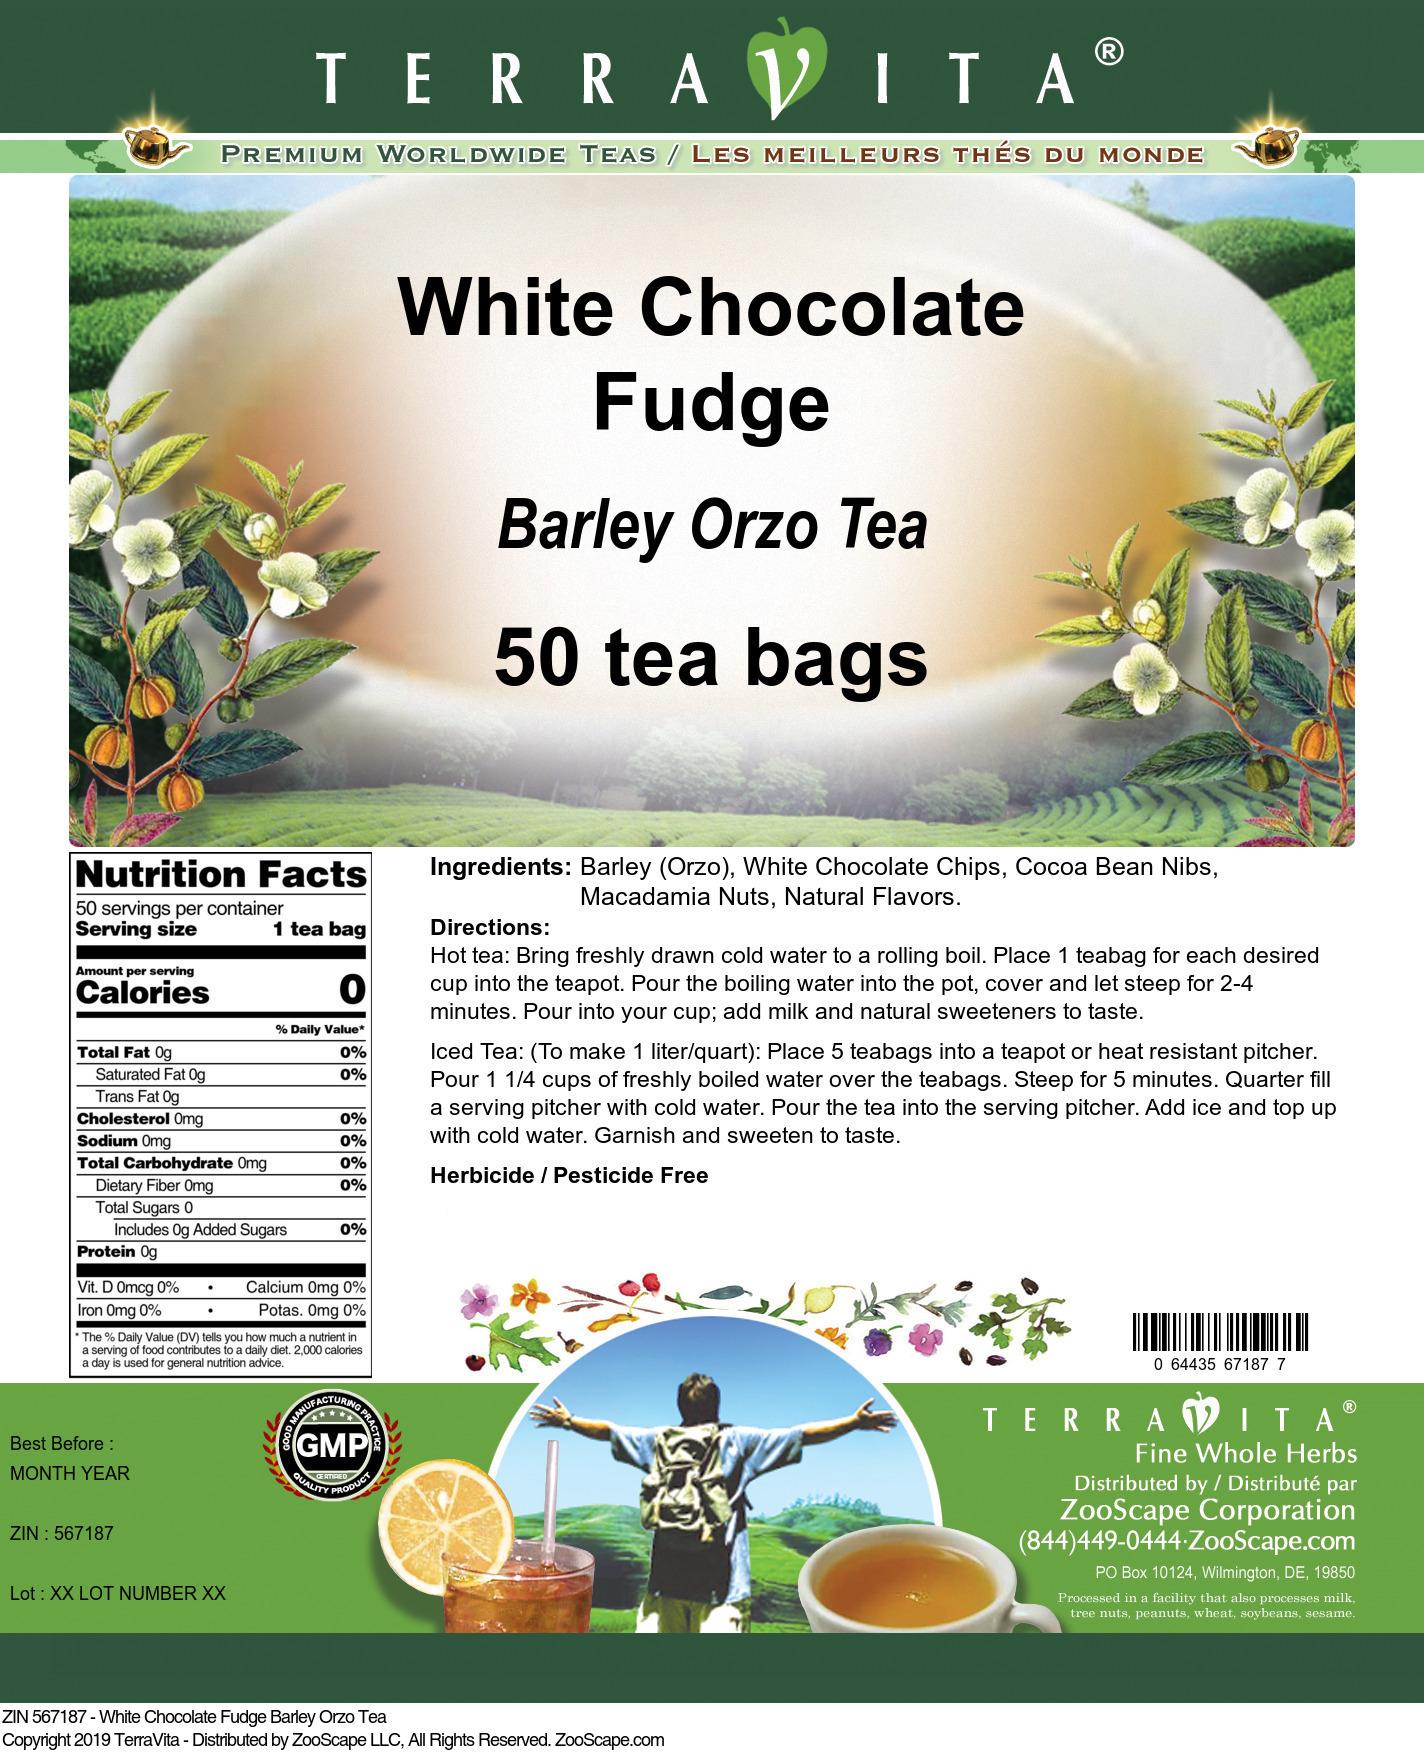 White Chocolate Fudge Barley Orzo